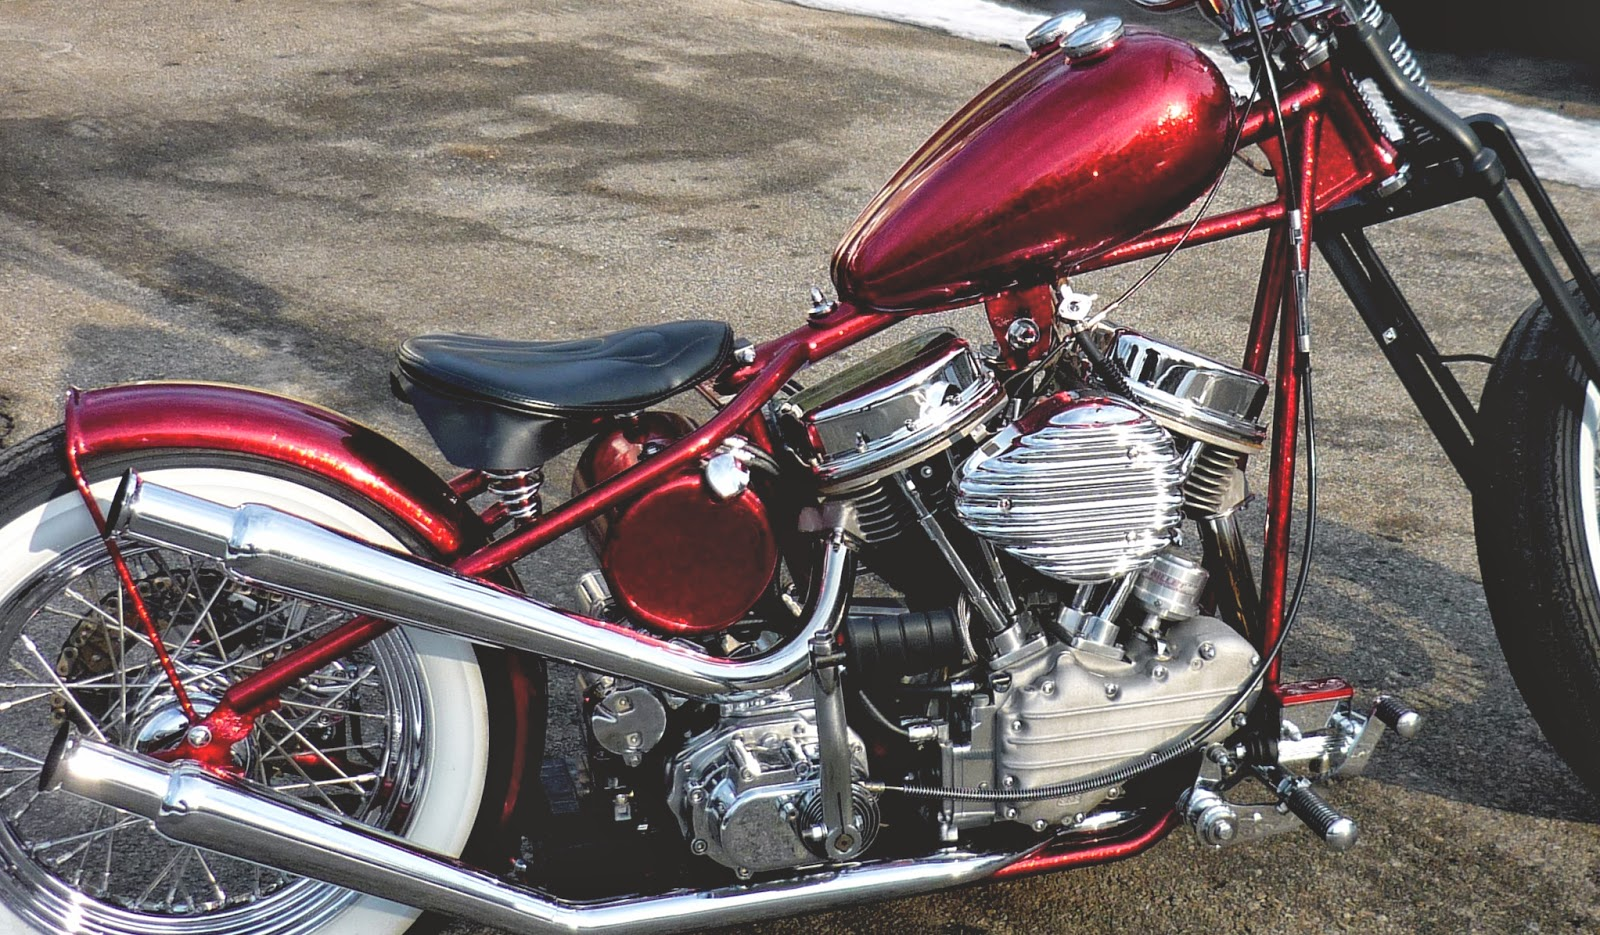 Moto-Mucci: FOR SALE: Custom Harley Panhead Bobber